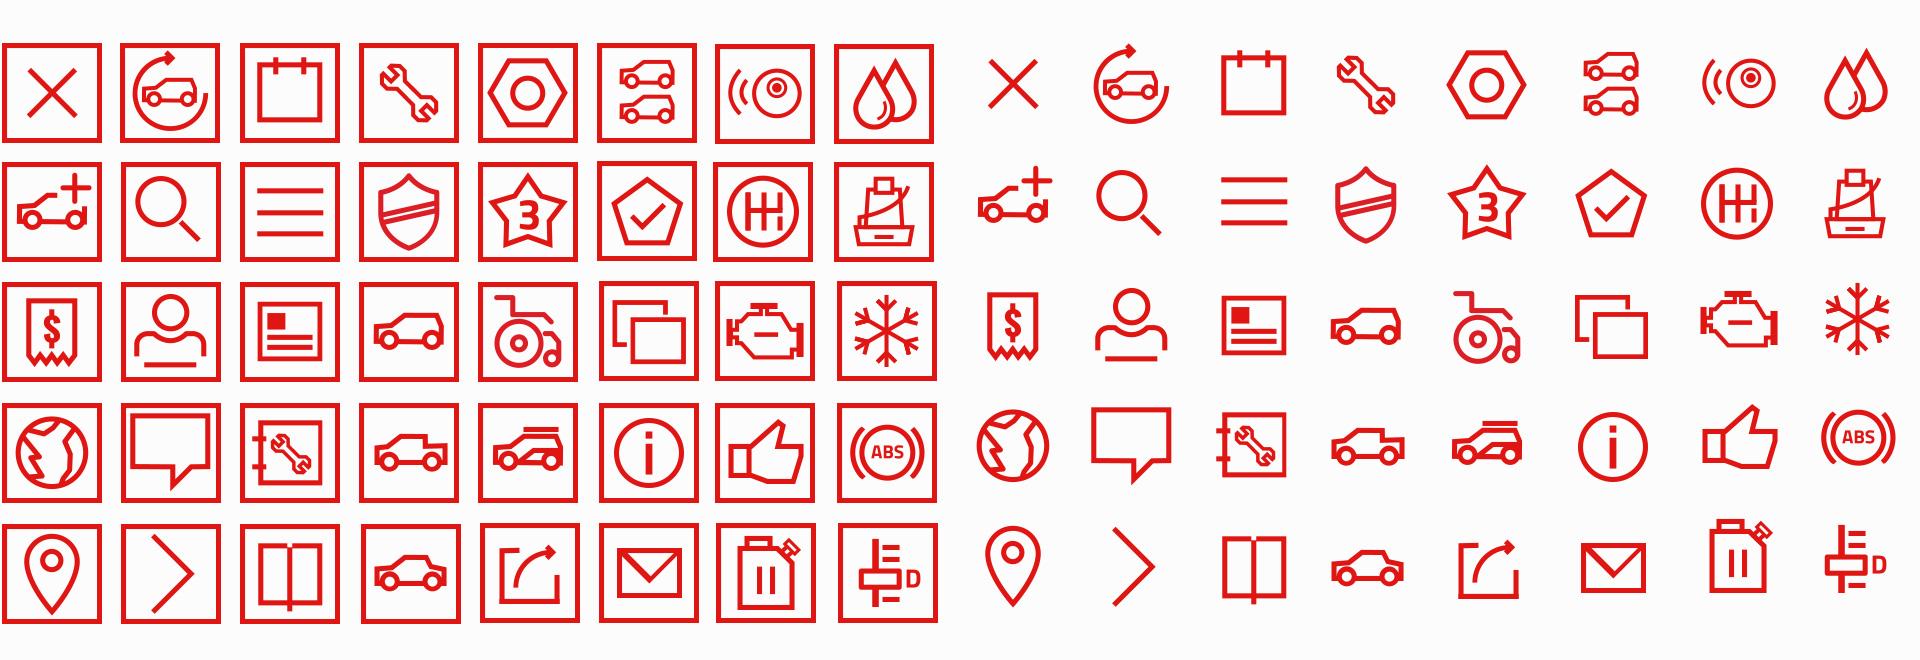 08_icones.jpg